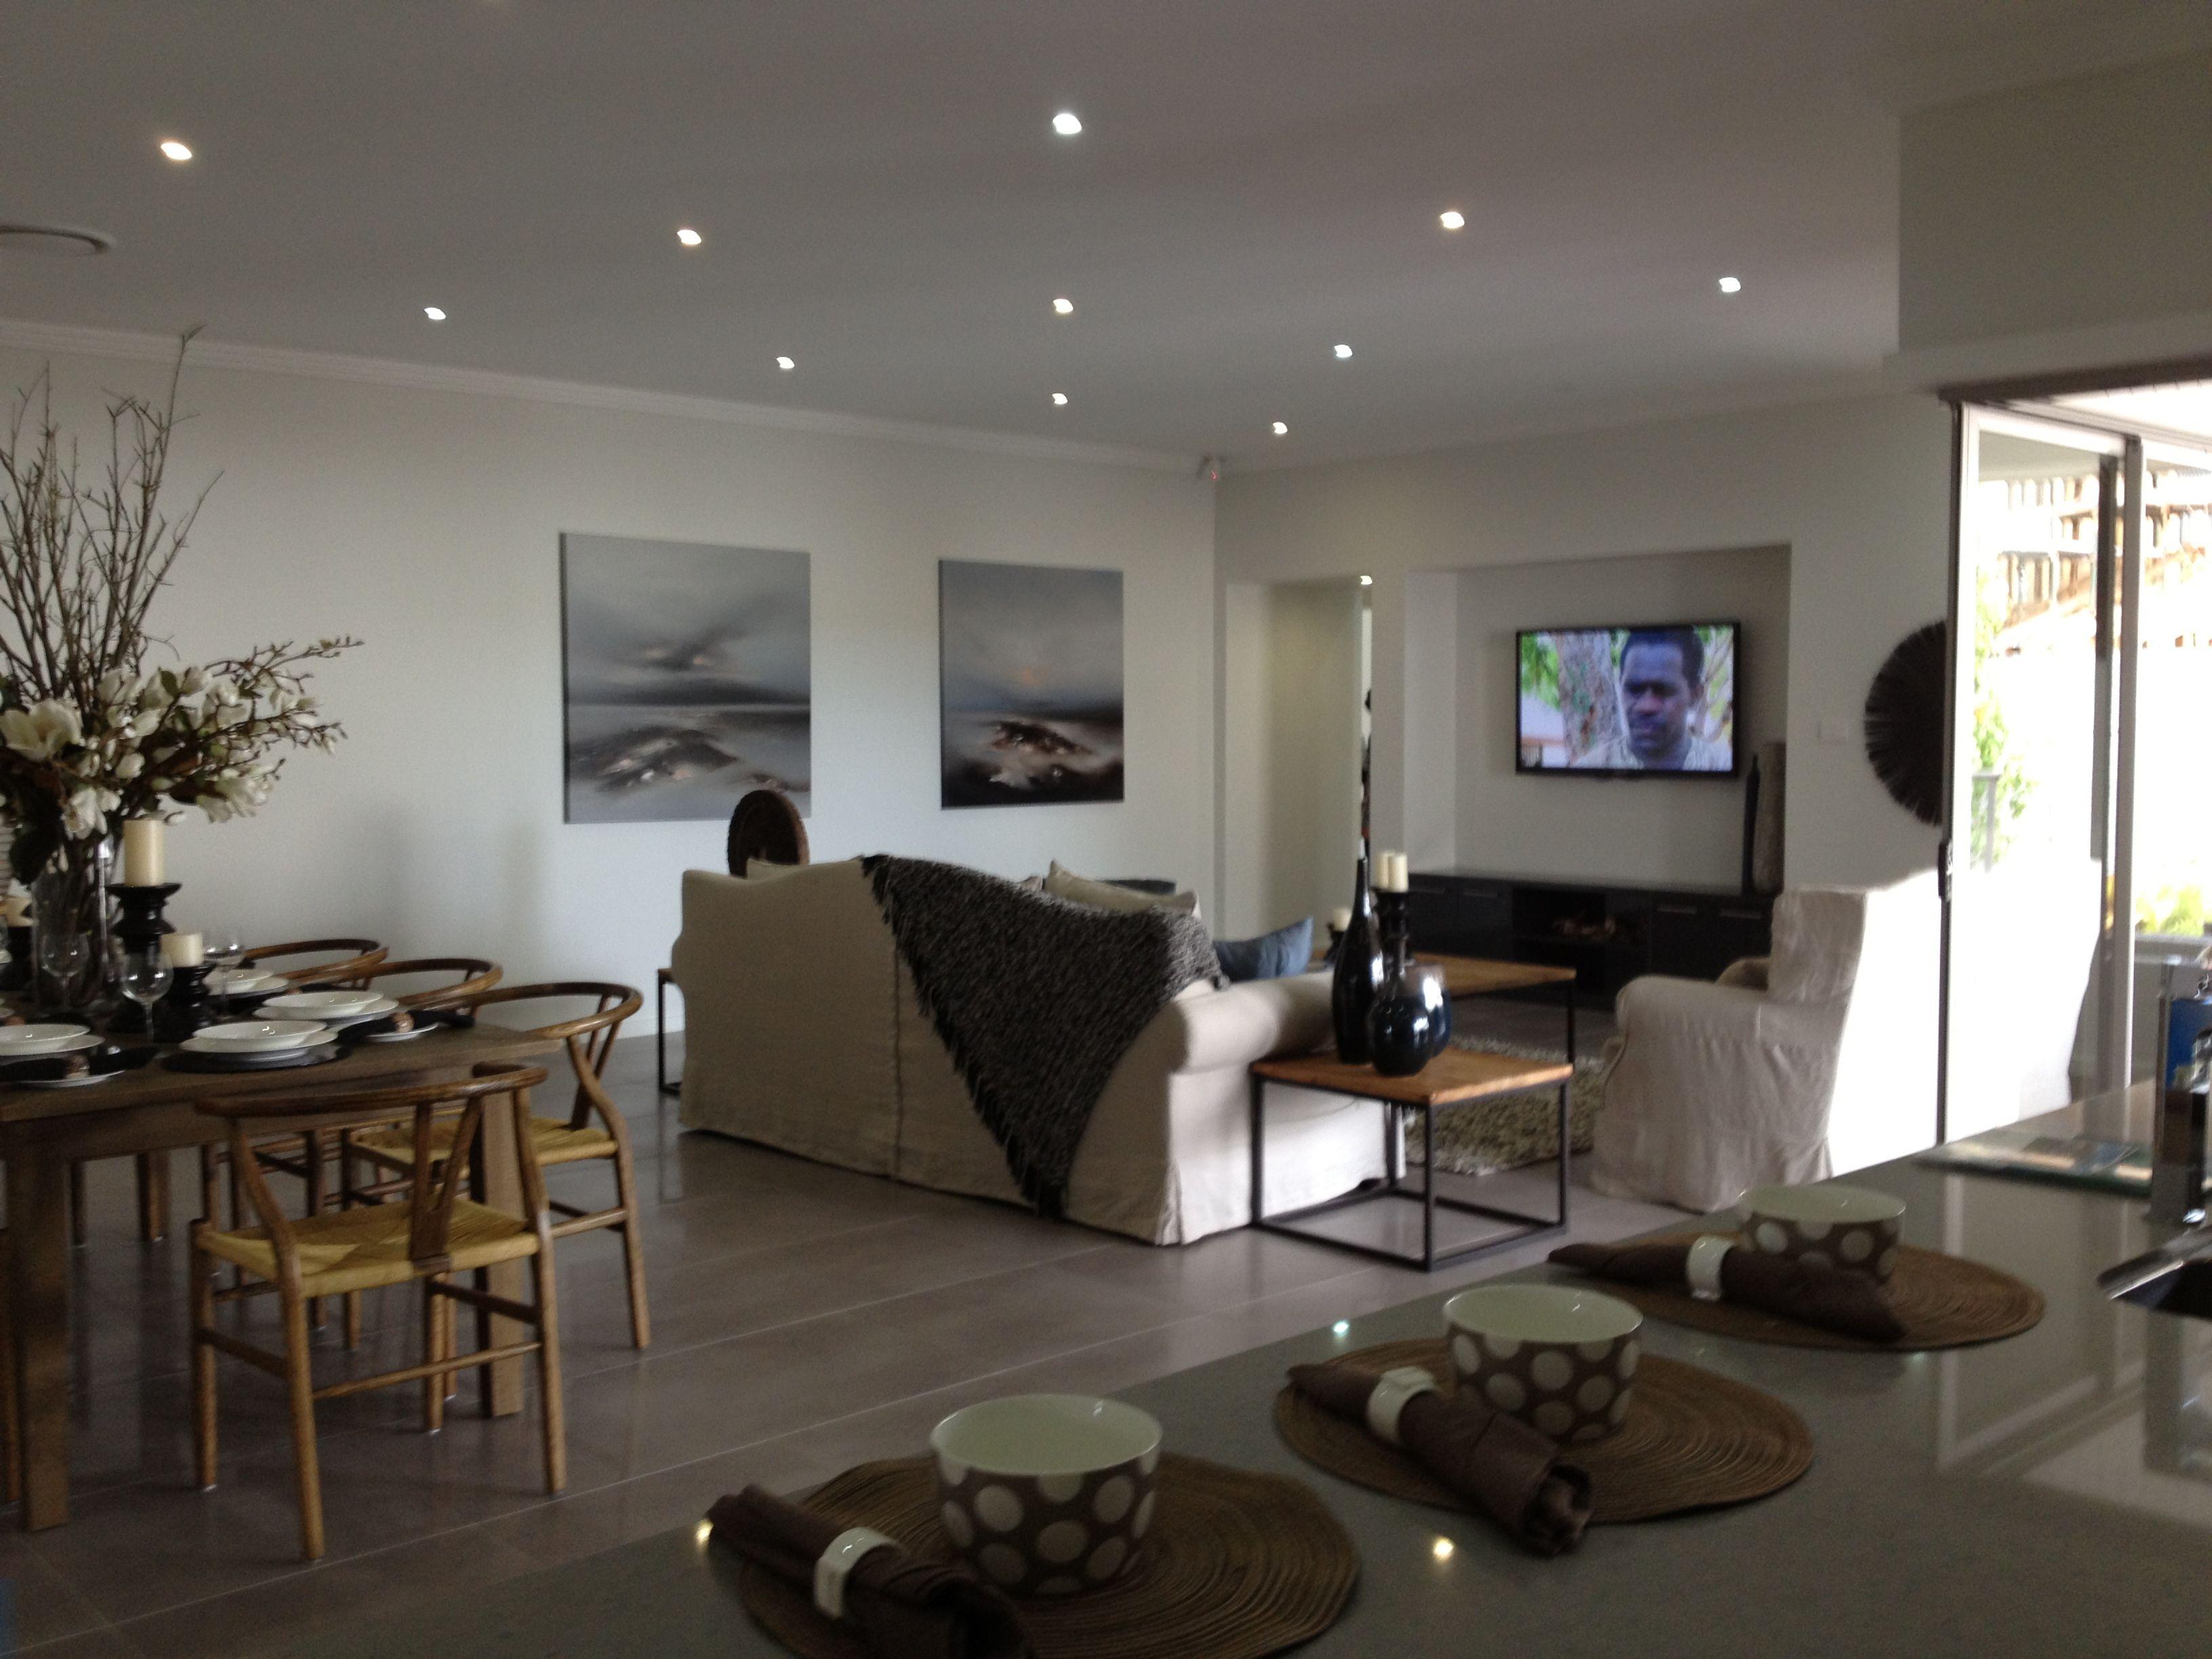 Beechwood homes bedarra 33 home designs pinterest home for The beechwood